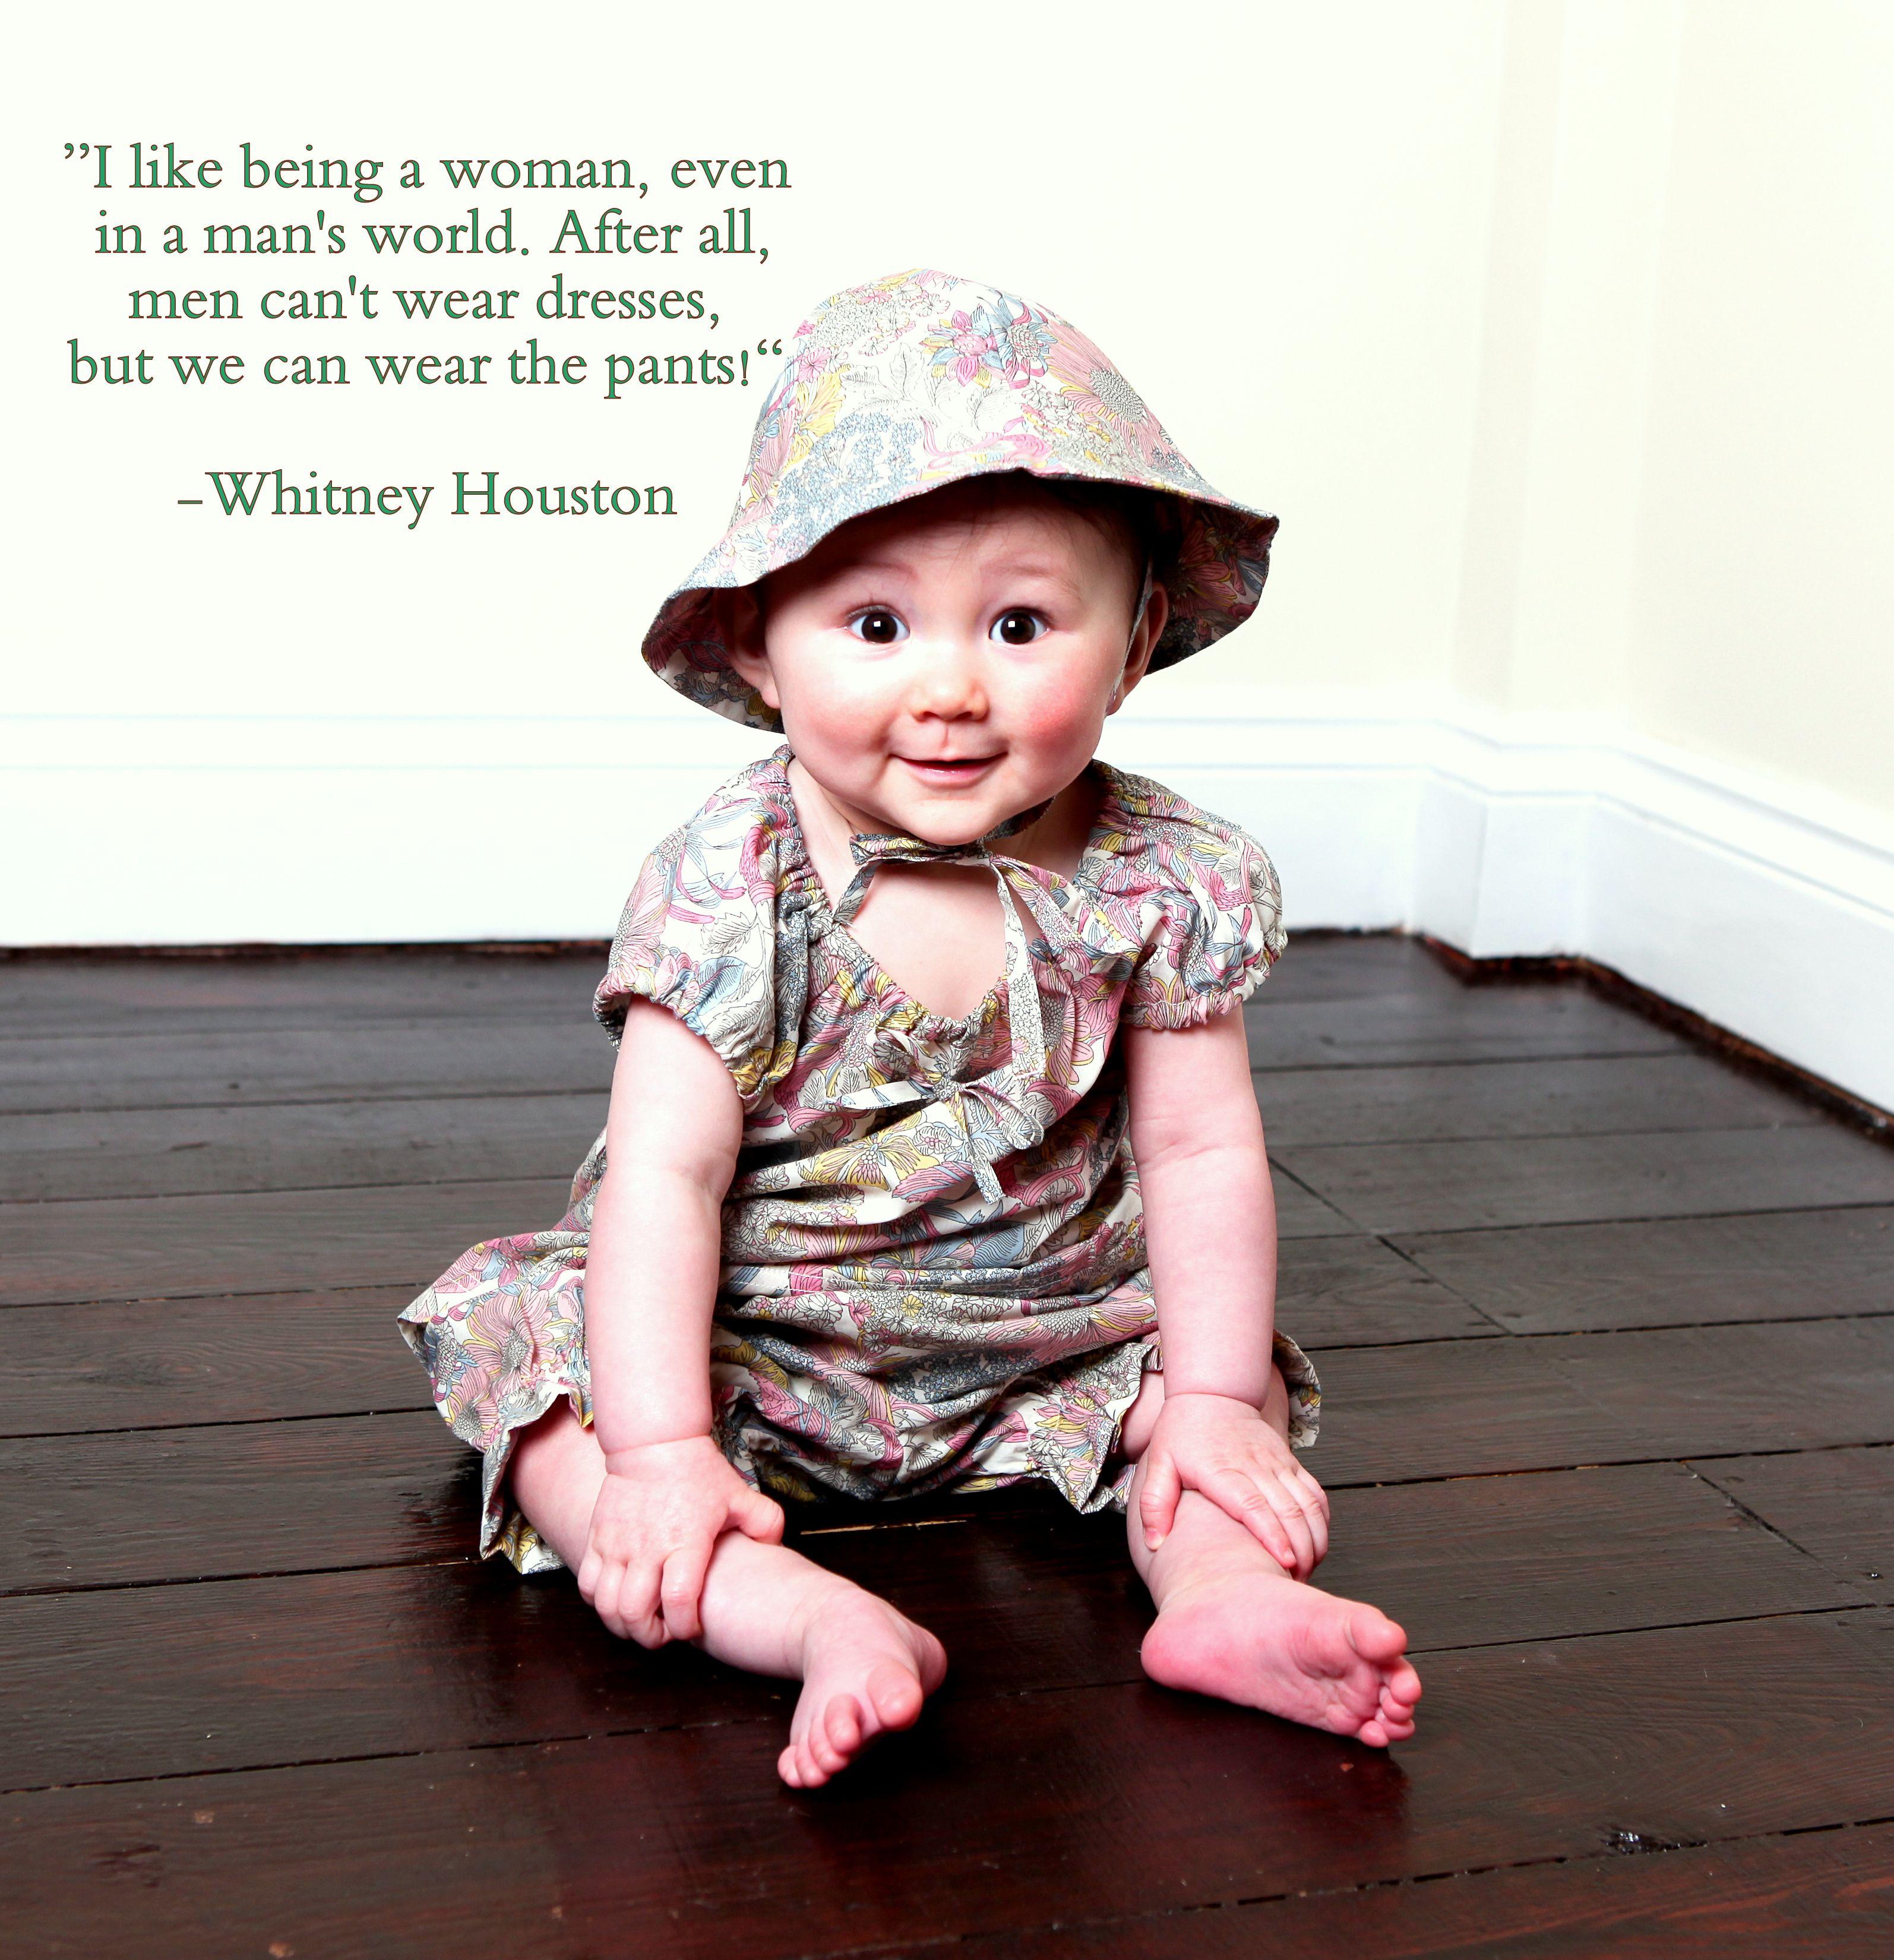 Baby scrapbook ideas uk - Http Www Suehillhandknits Co Uk Baby Girls